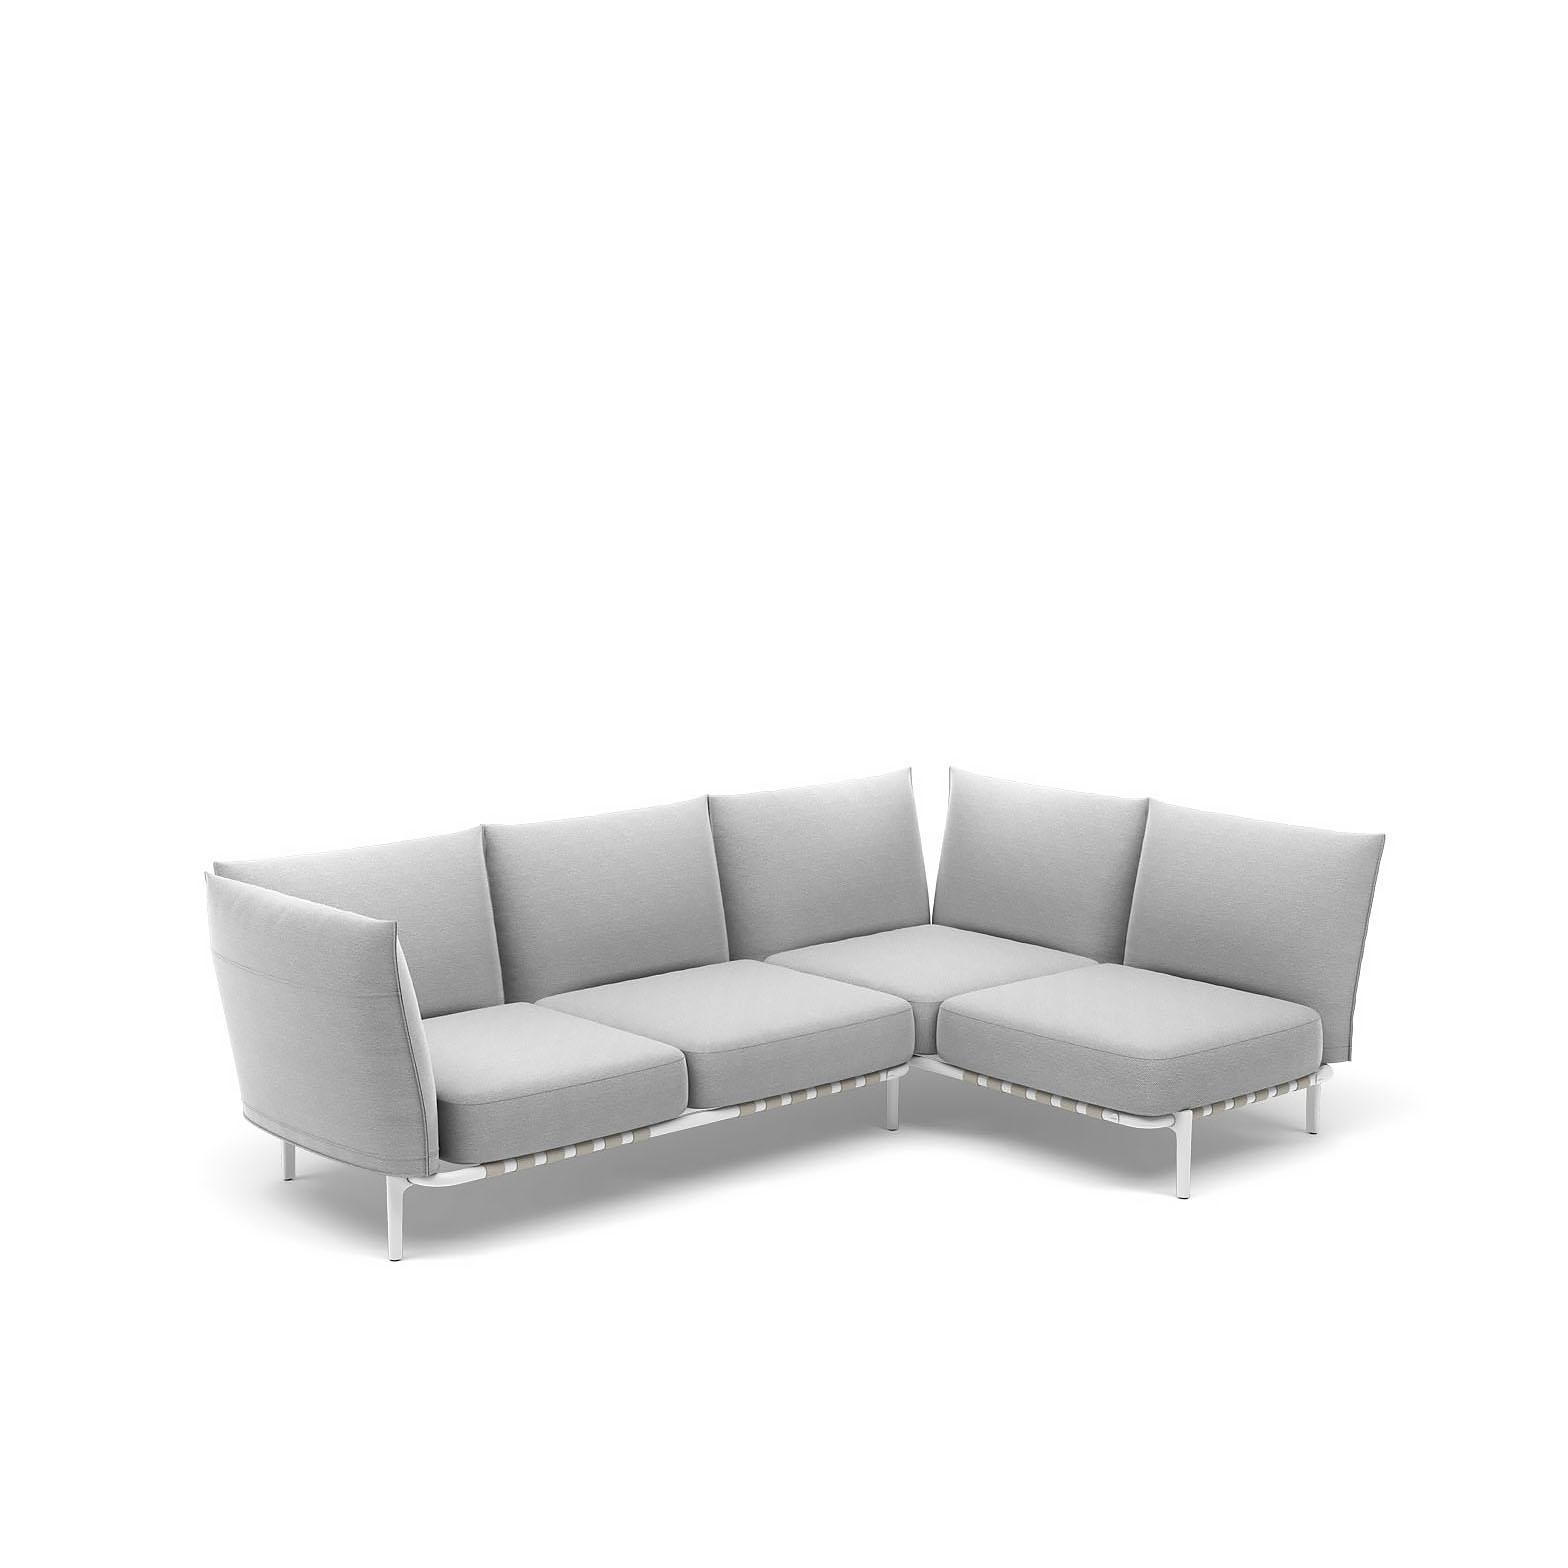 DEDON-BREA-L-Sofa-left.jpg